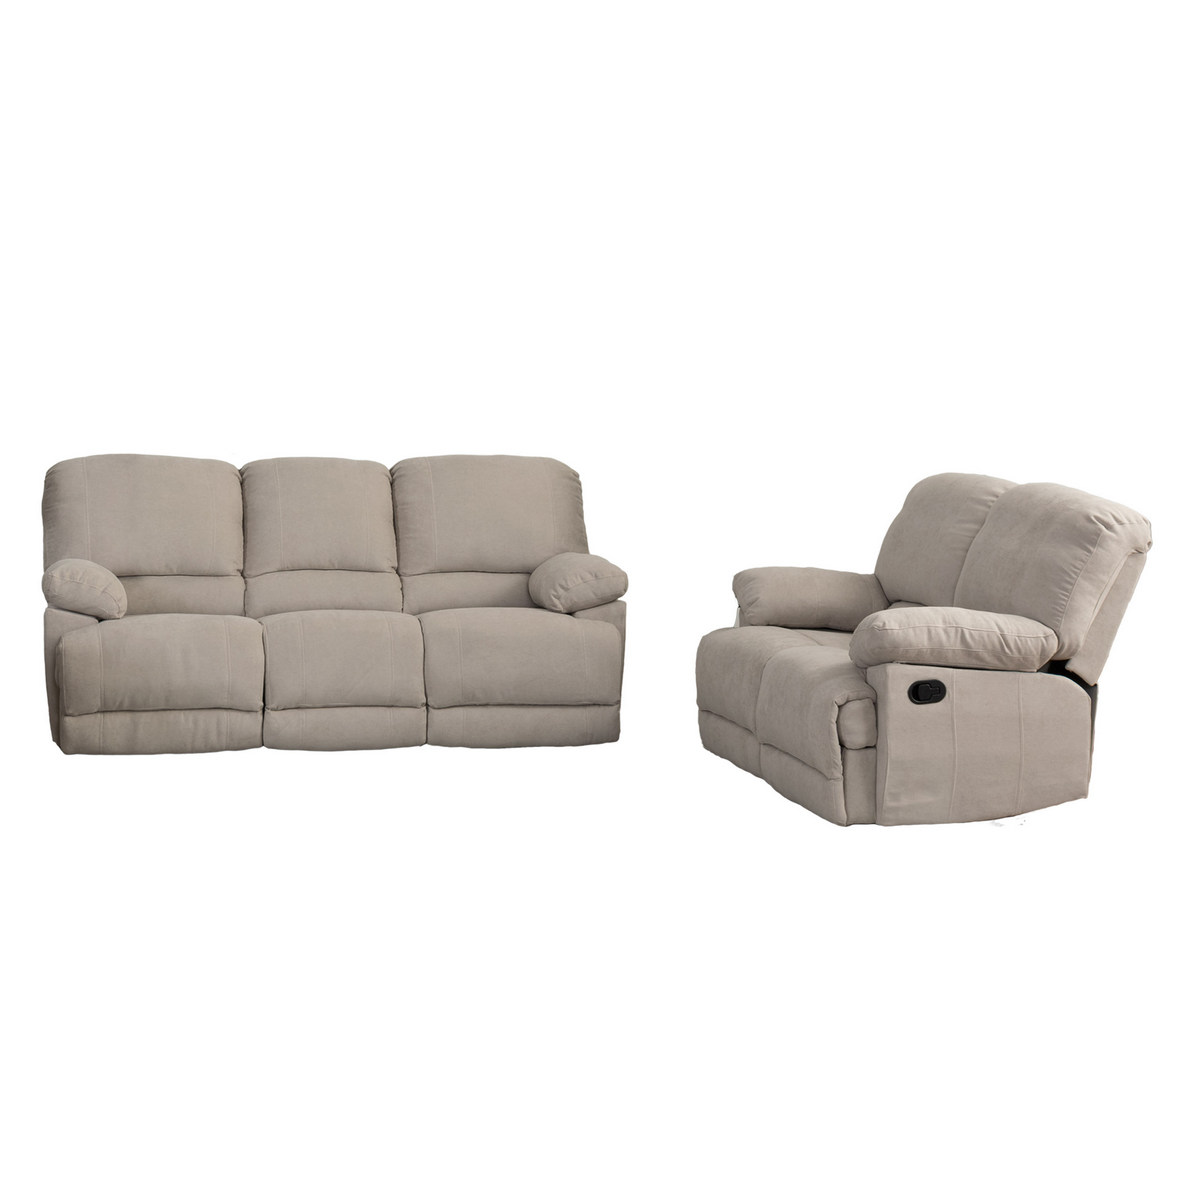 Corliving Beige Fabric Reclining Sofa Set